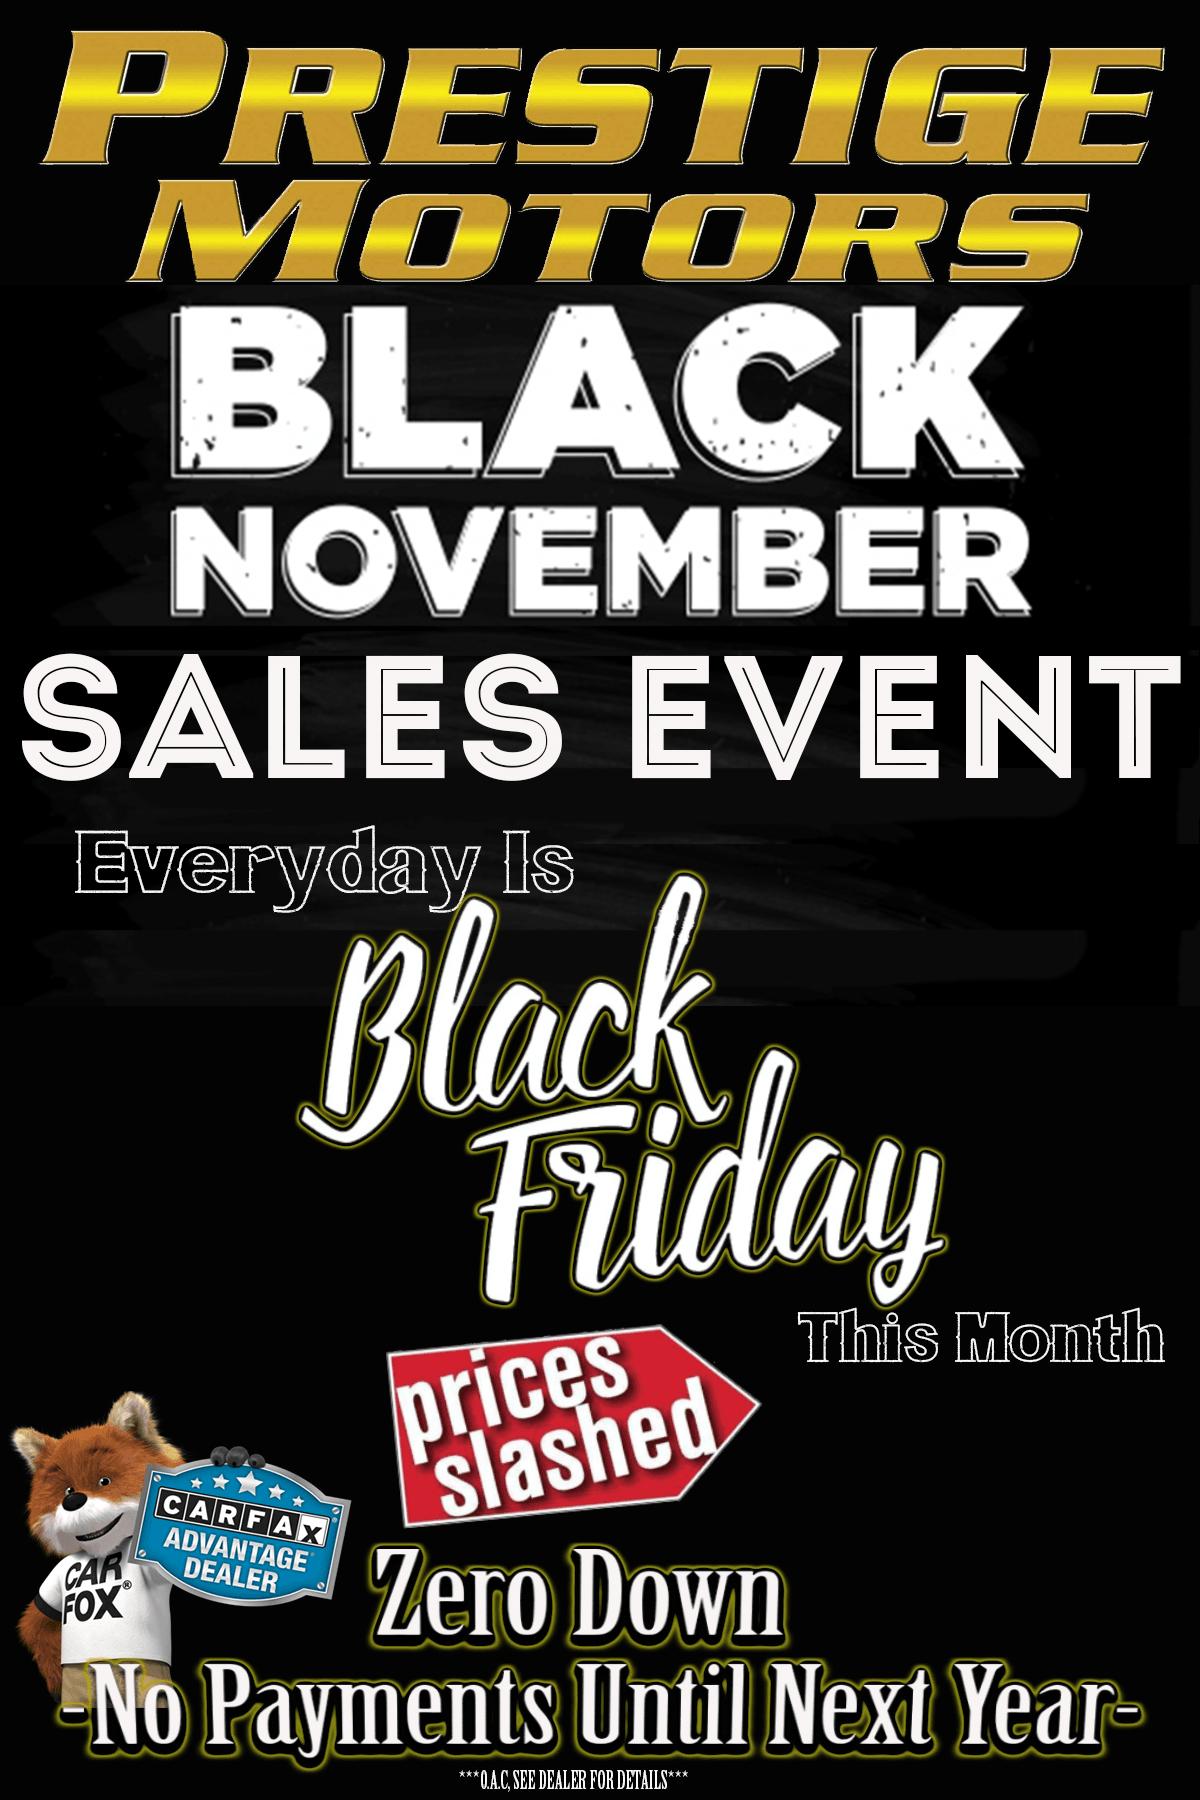 Prestige Motors Black November Sales Event